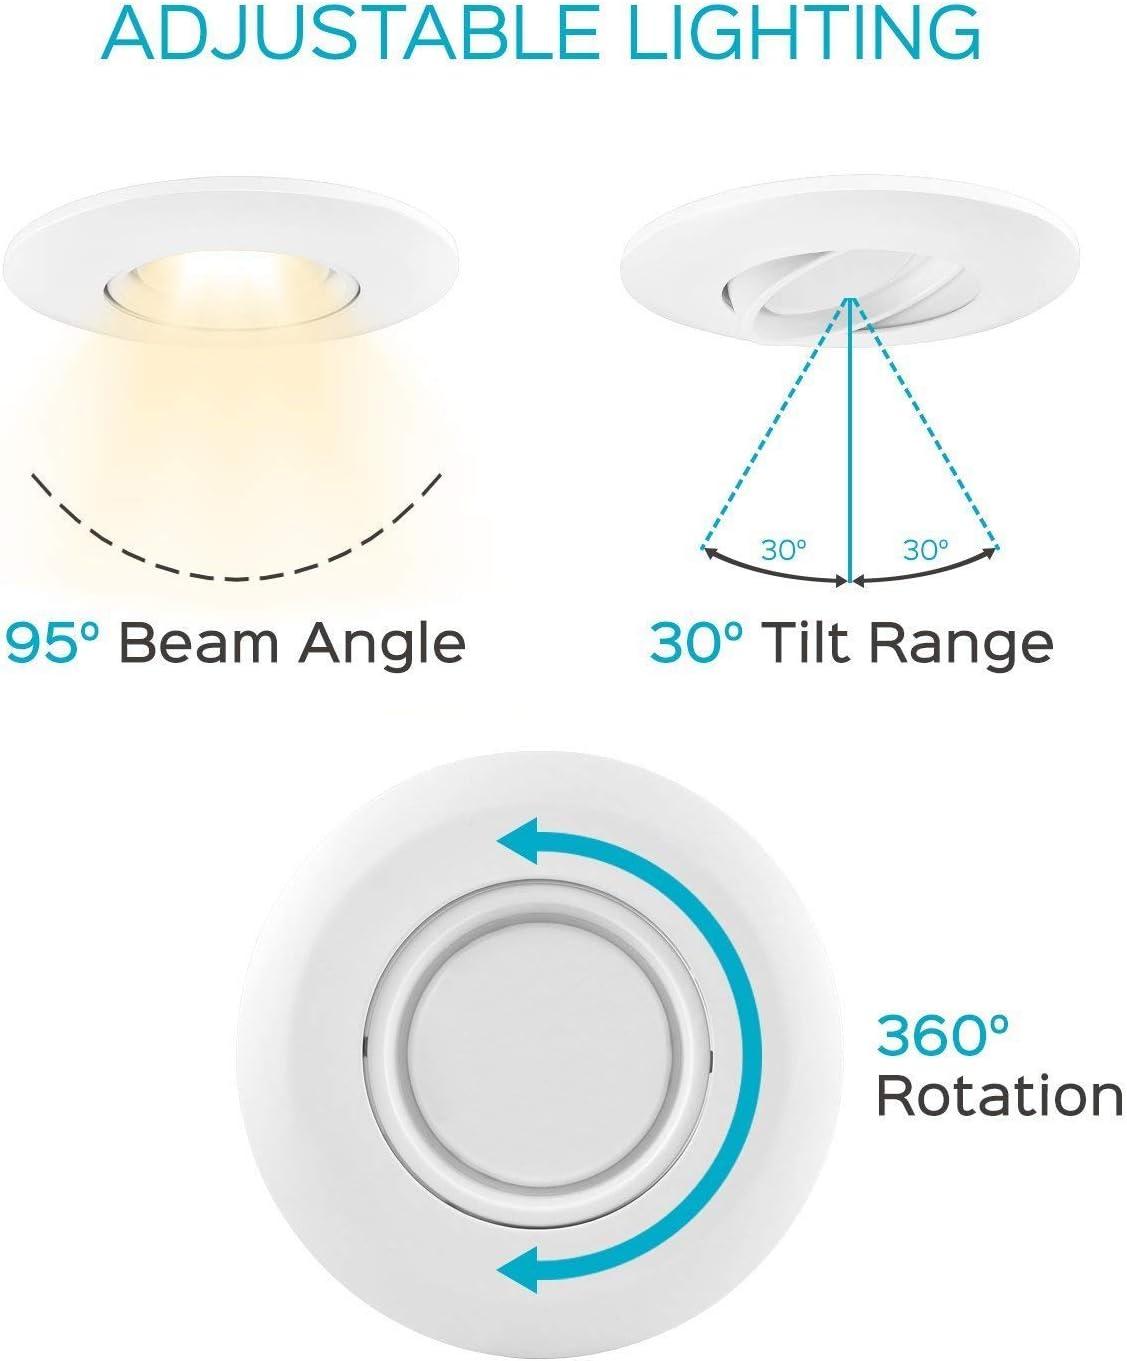 White Trim 4 Pack Dimmable Round 120V- 5 YR Warranty- 50,000 Life Hours 3000 Kelvin 120 Watt Incandescent Equal 1060 Lumens Elite LED 6 Inch Gimbal Adjustable Lens Downlight 15 Watt